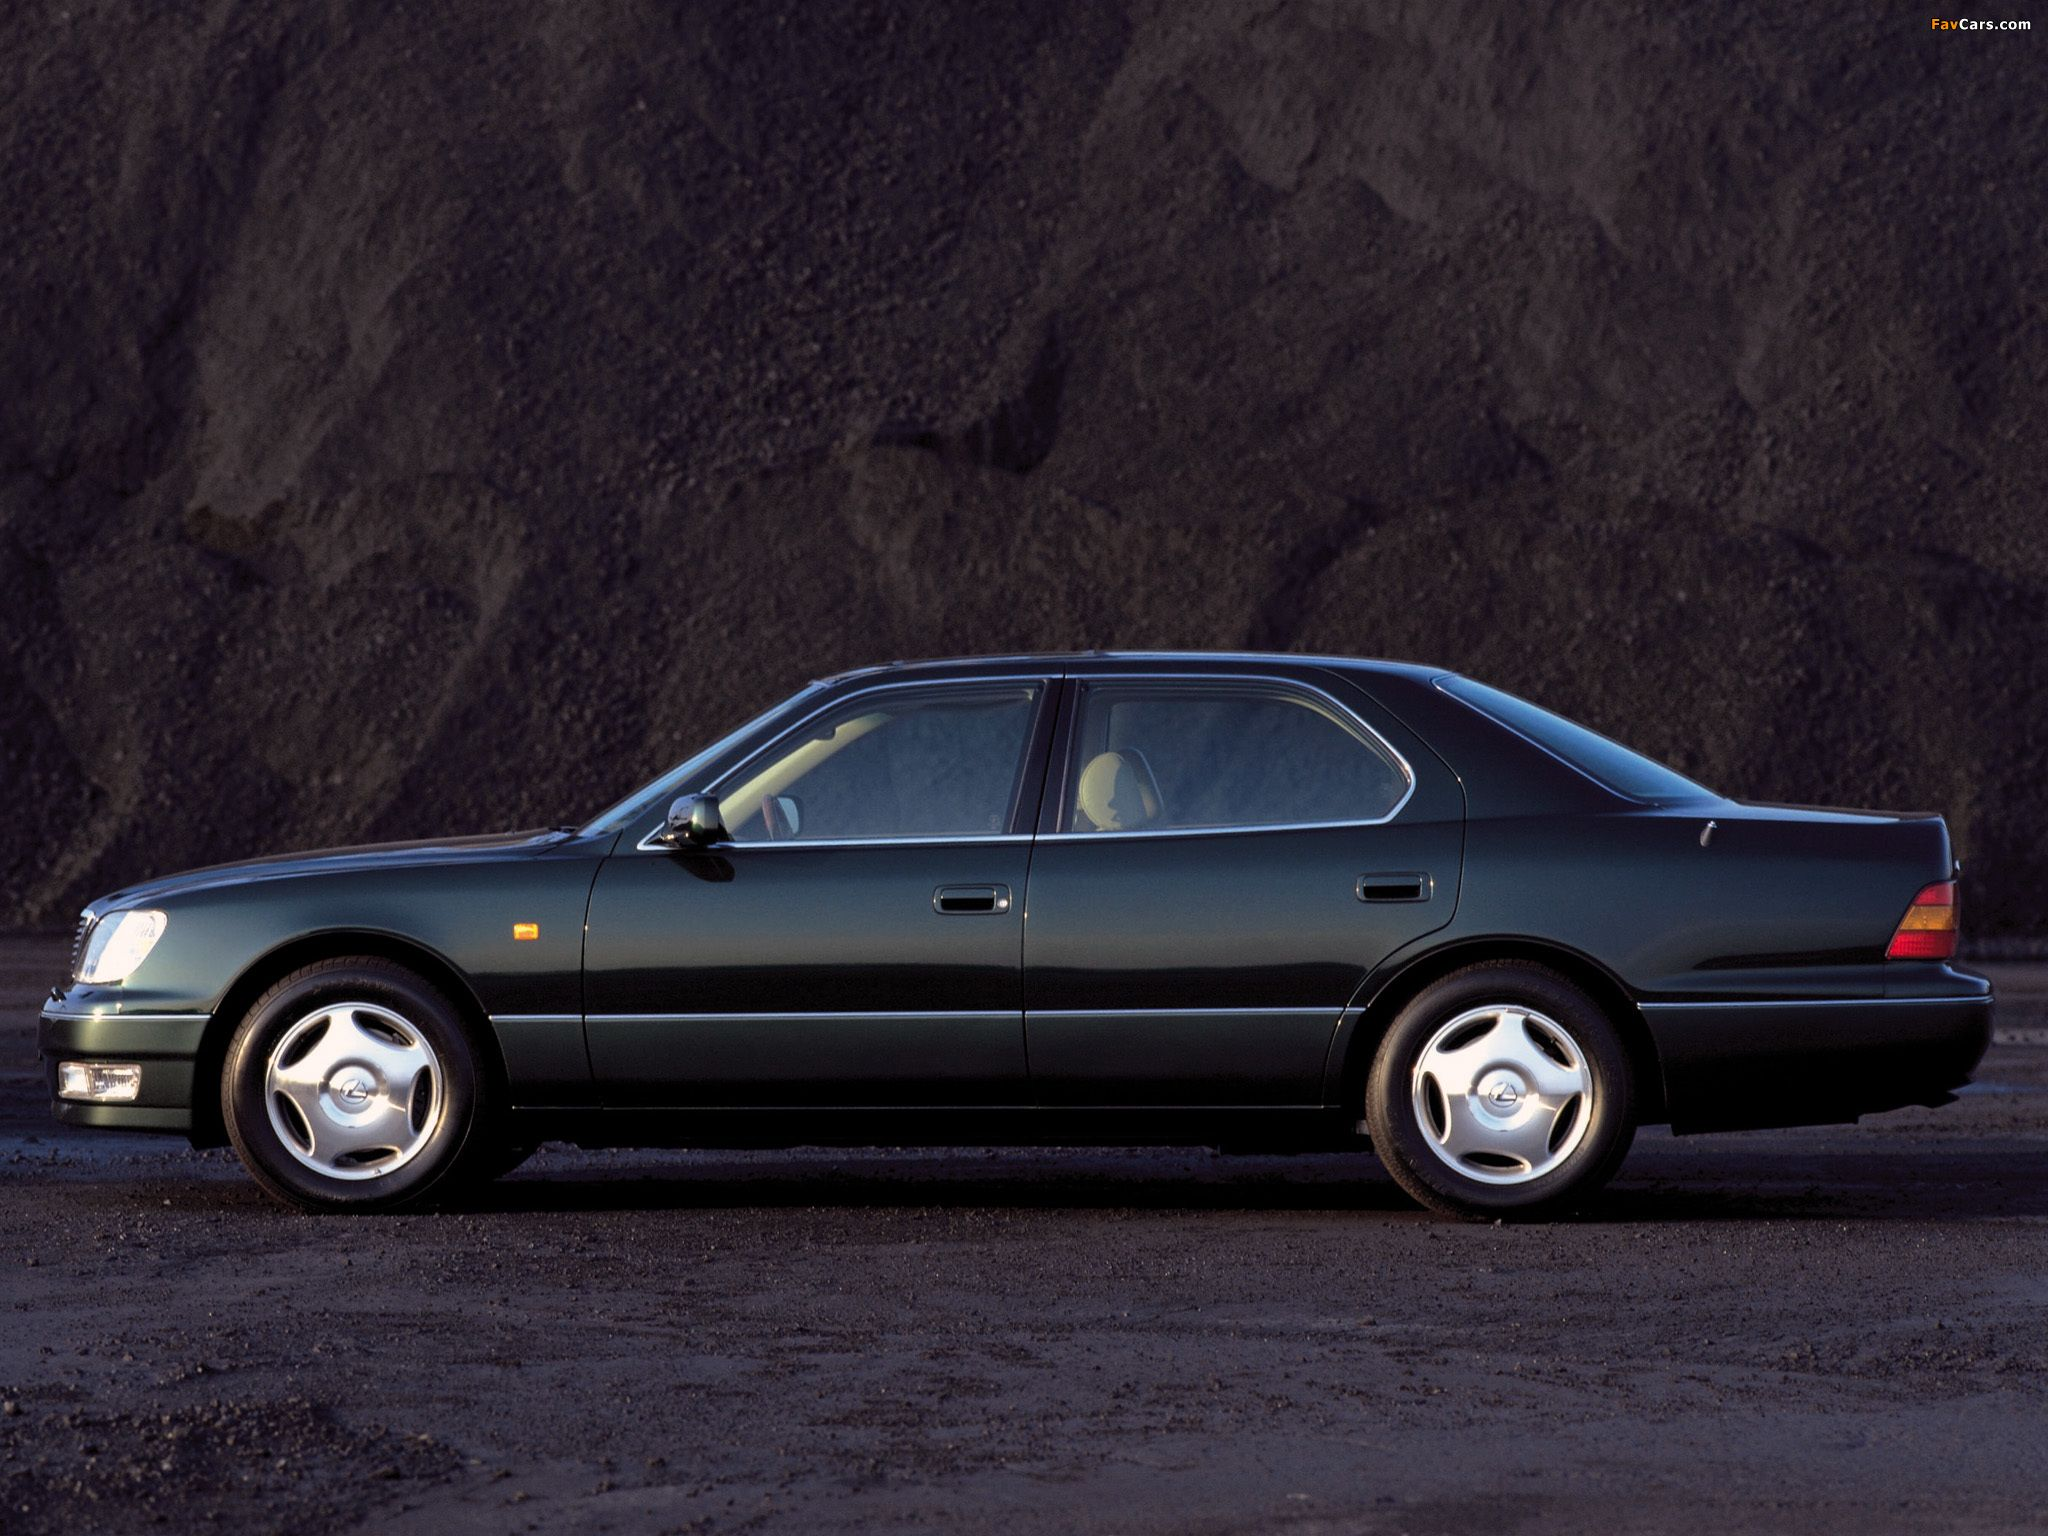 small resolution of 1997 lexus ls400 lexus gs300 fuel economy japanese cars car photos model